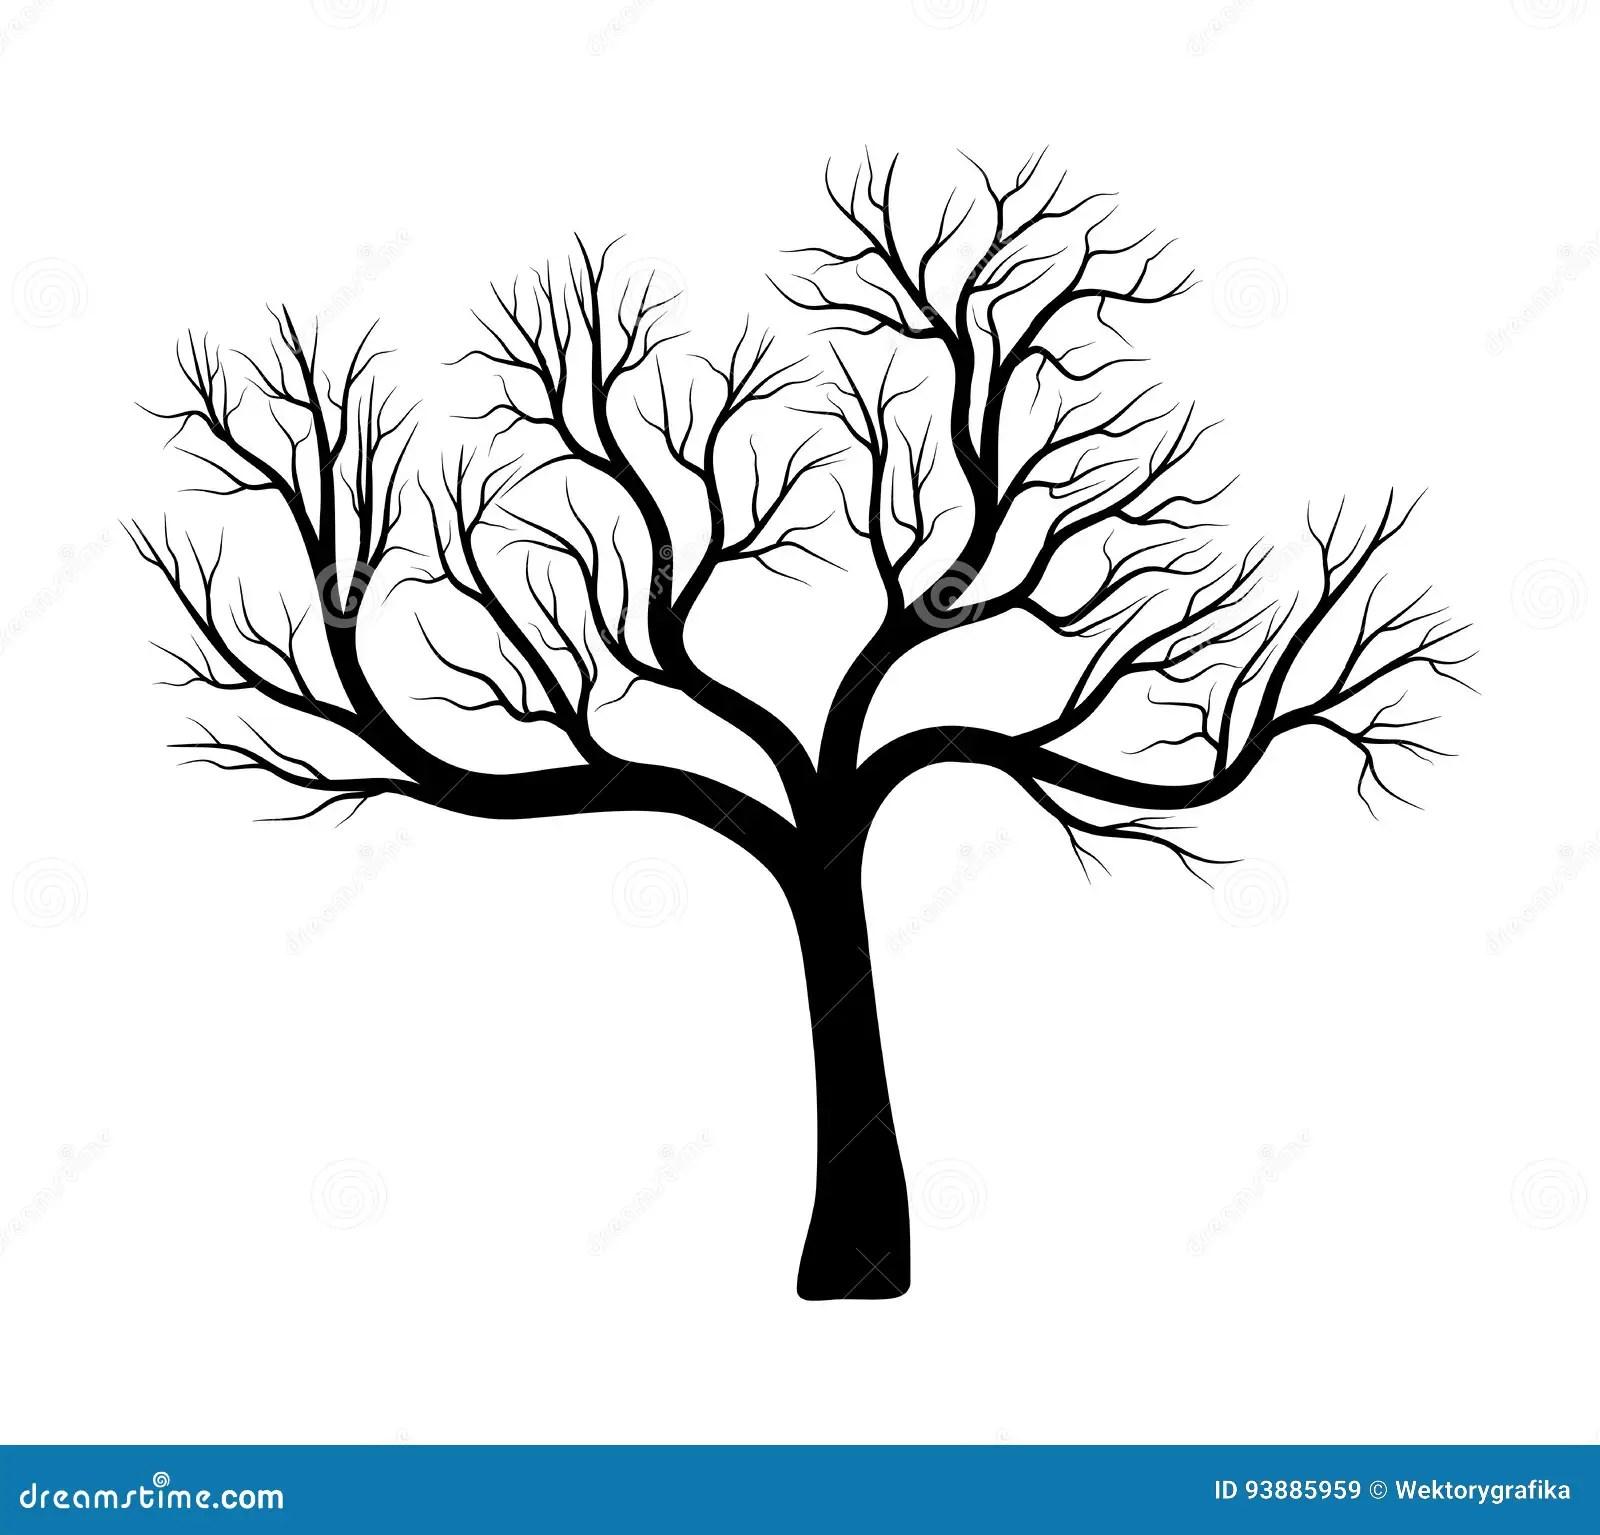 Black Silhouette Bare Tree Vector Illustration Cartoon